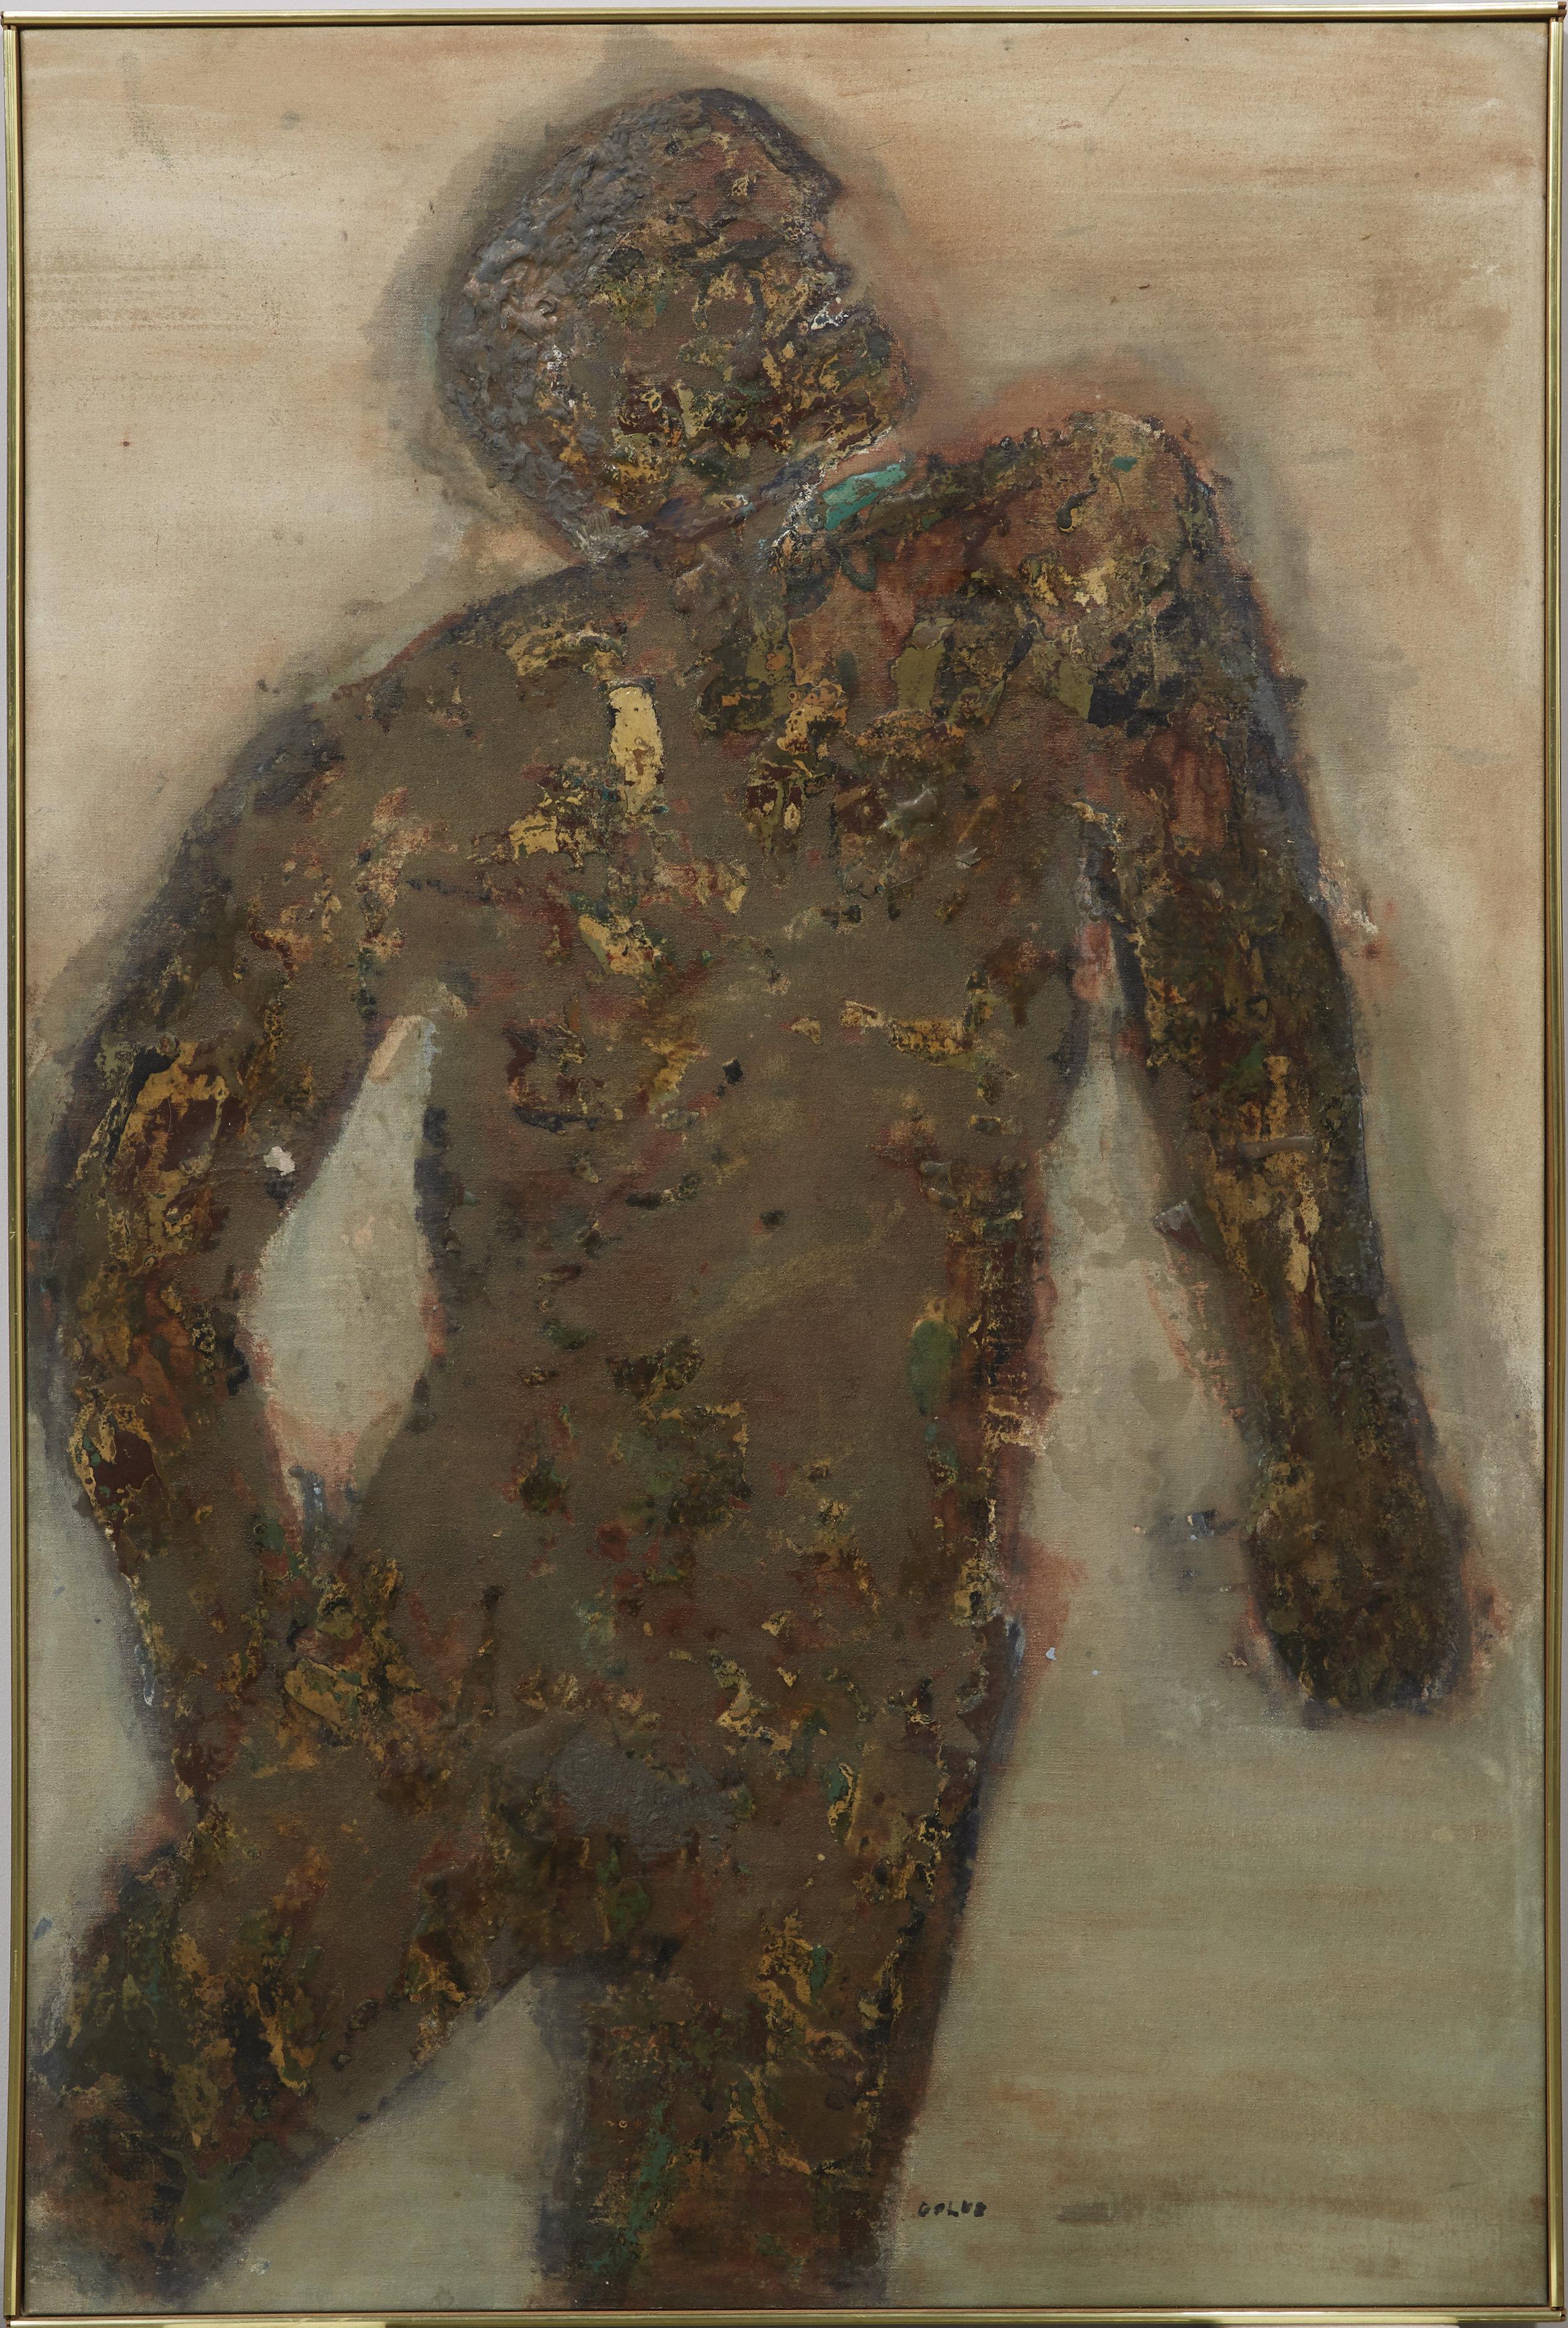 Burnt Man , Leon Golub,before treatment at The Center.